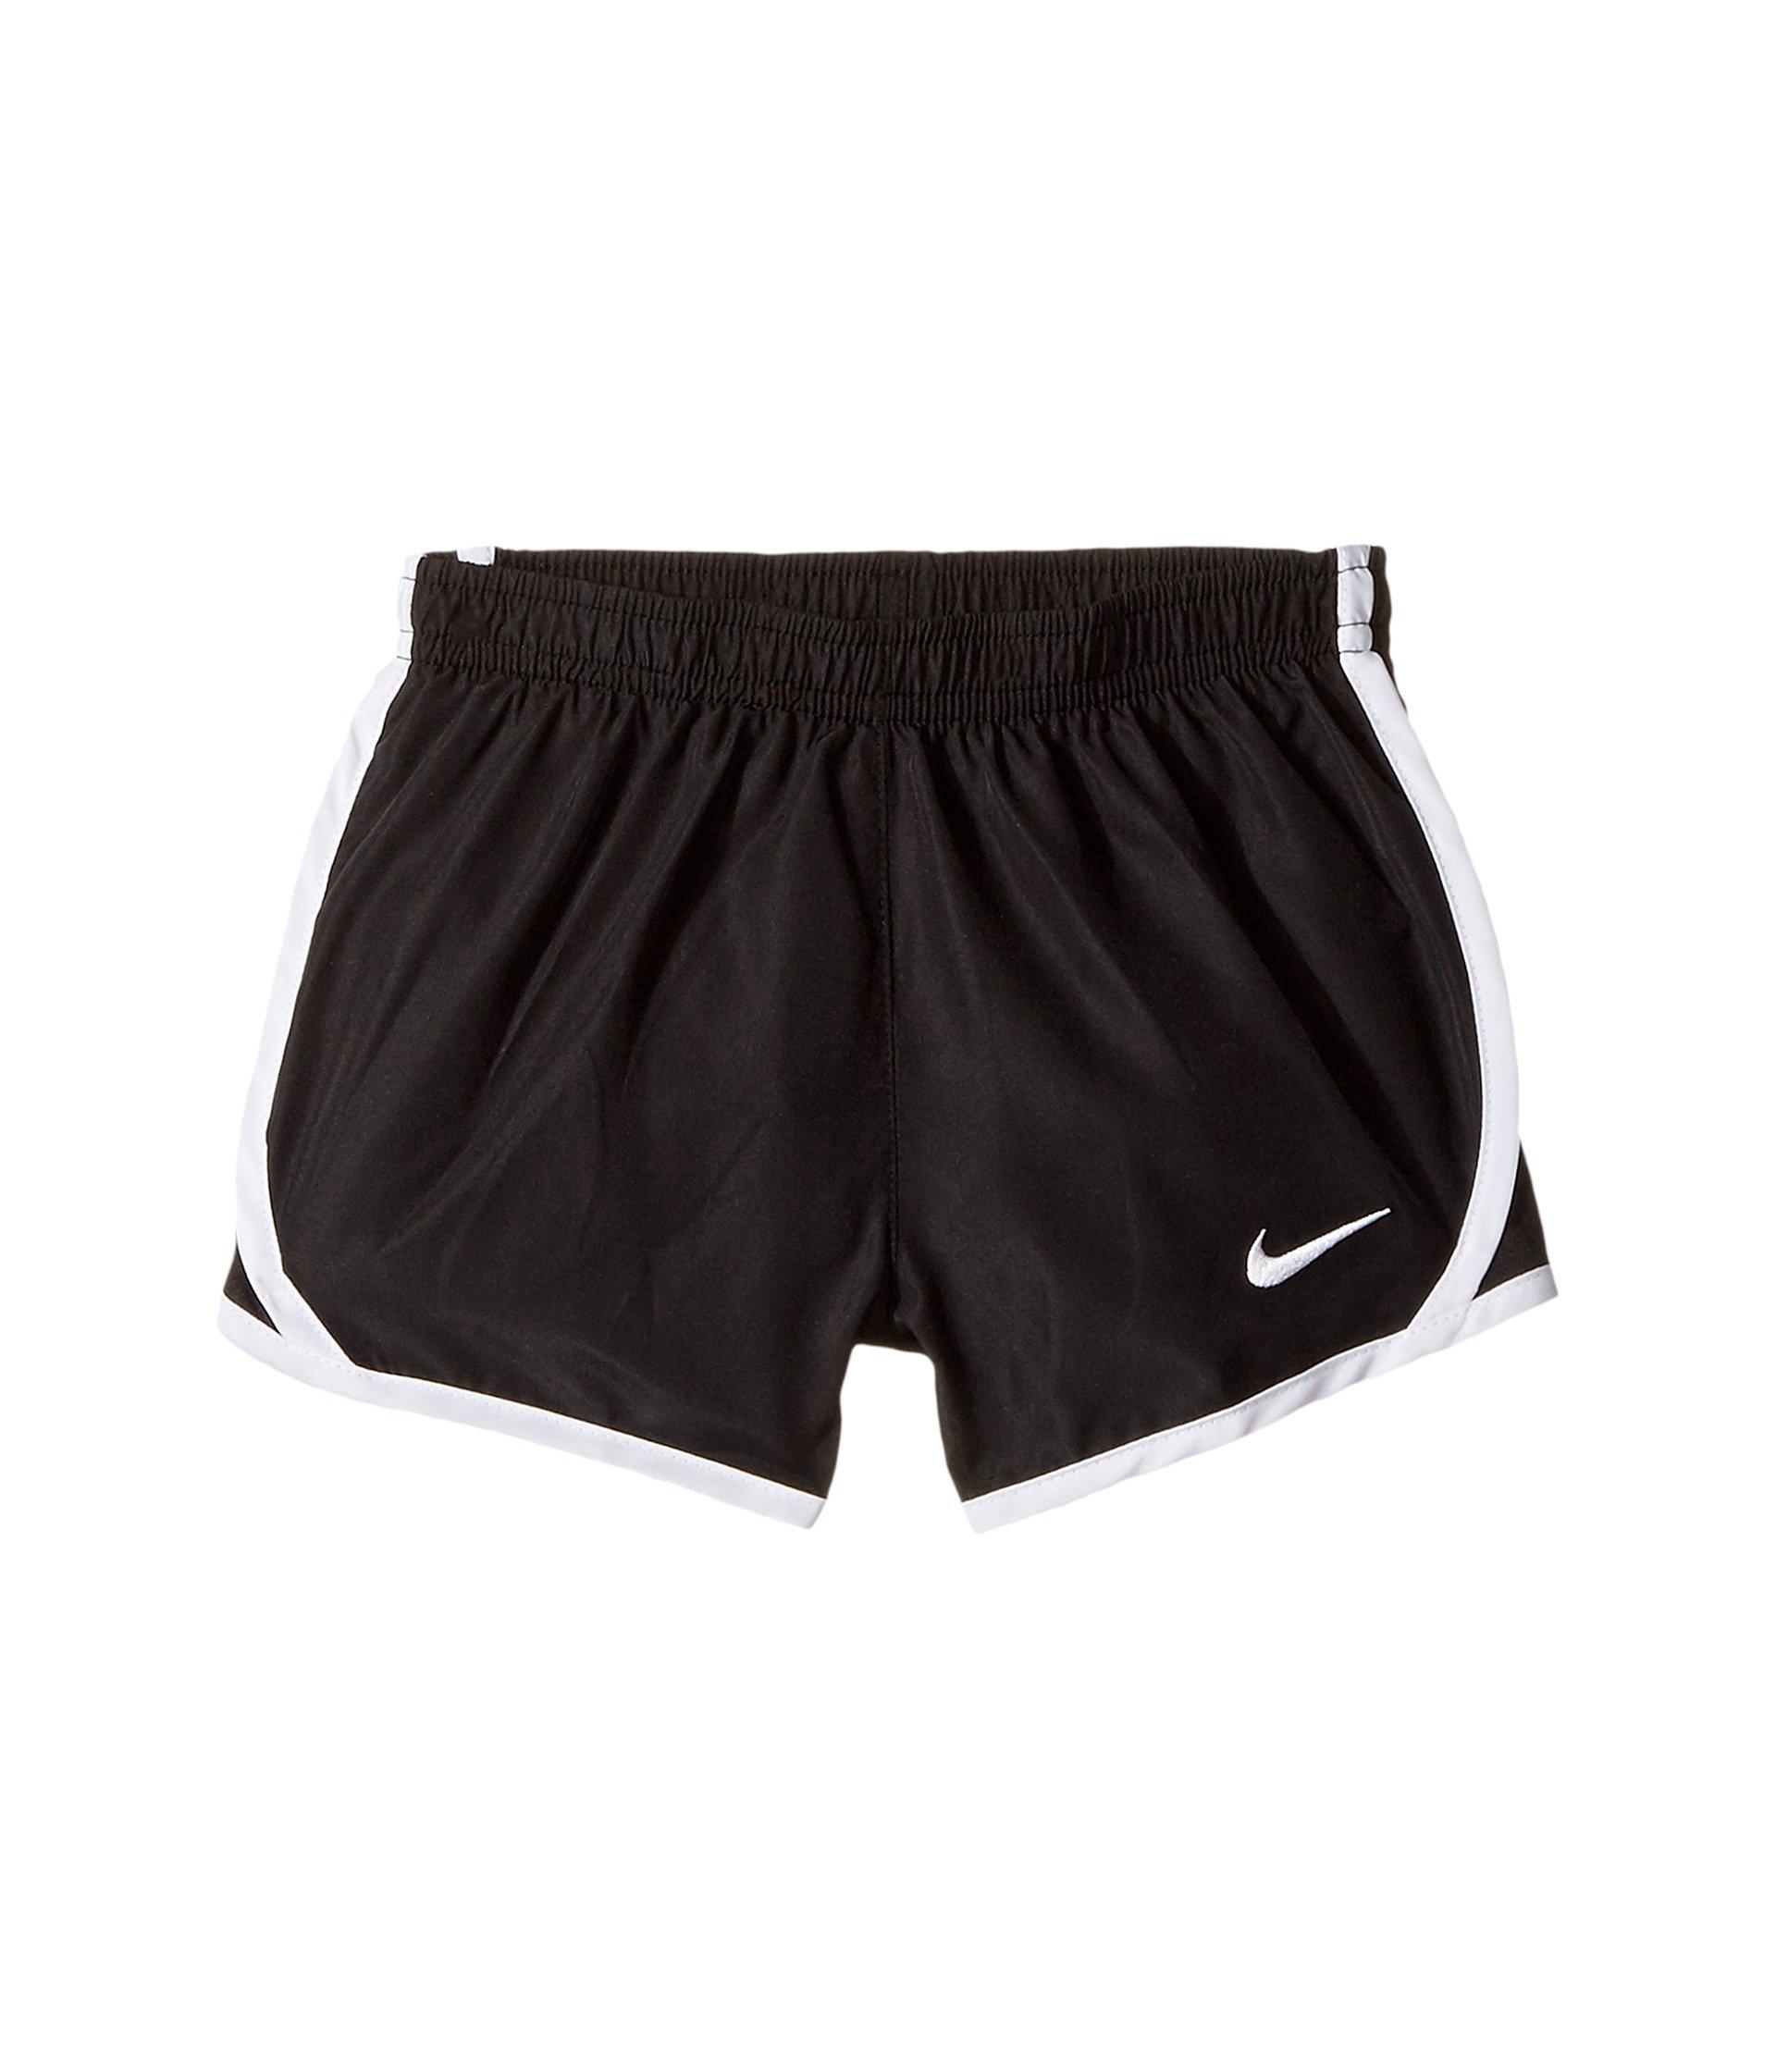 NIKE Girls' Dry Tempo Running Shorts (Black (167358-019)/White/White, 4T)